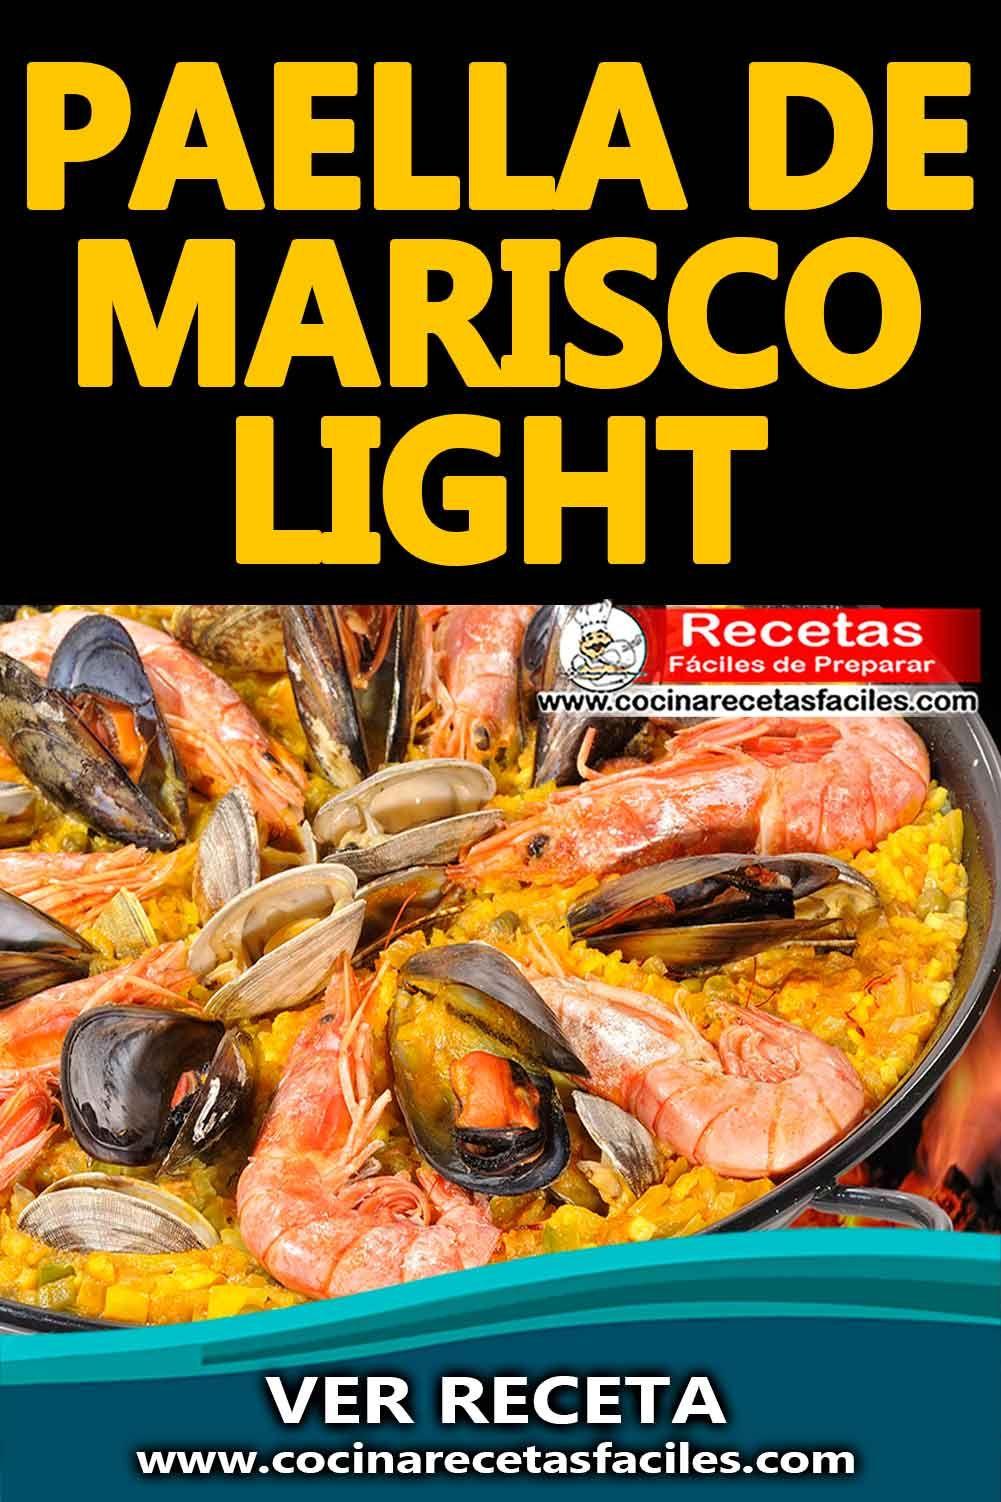 Paella De Marisco Light In 2021 International Recipes Recipes Food